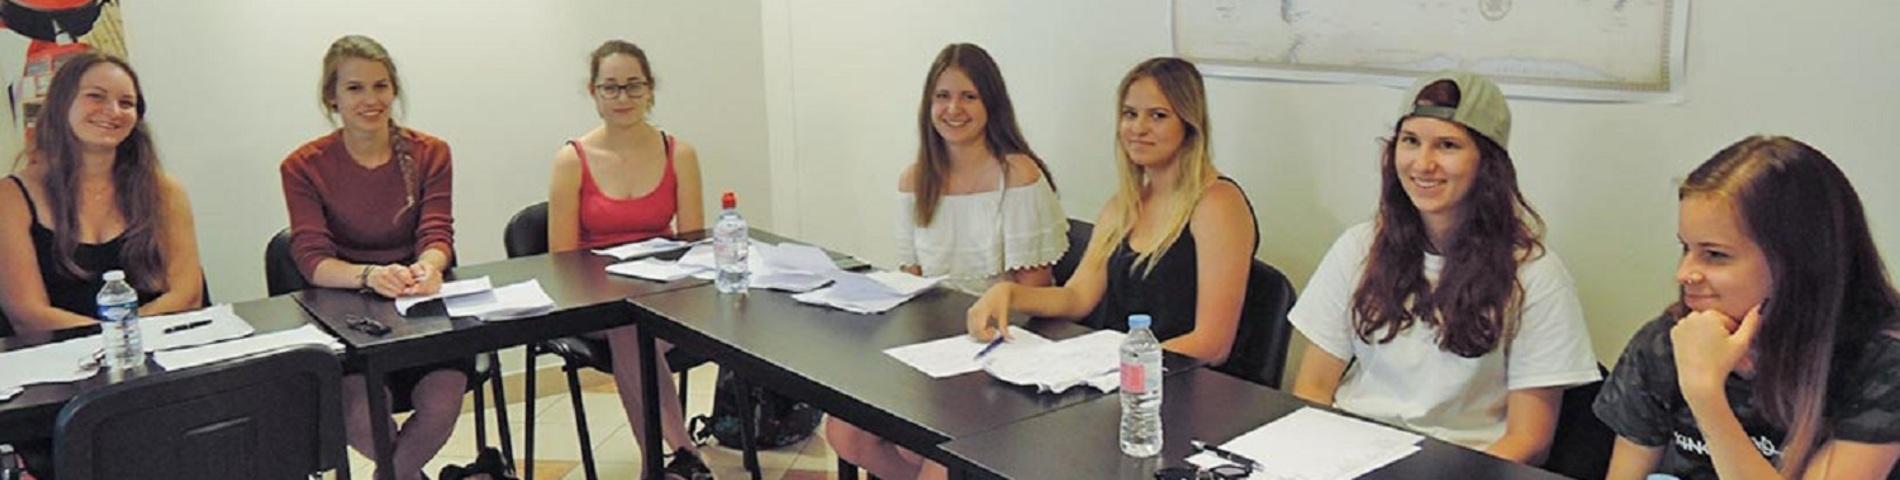 Obrázok školy Riviera French Institute – 1